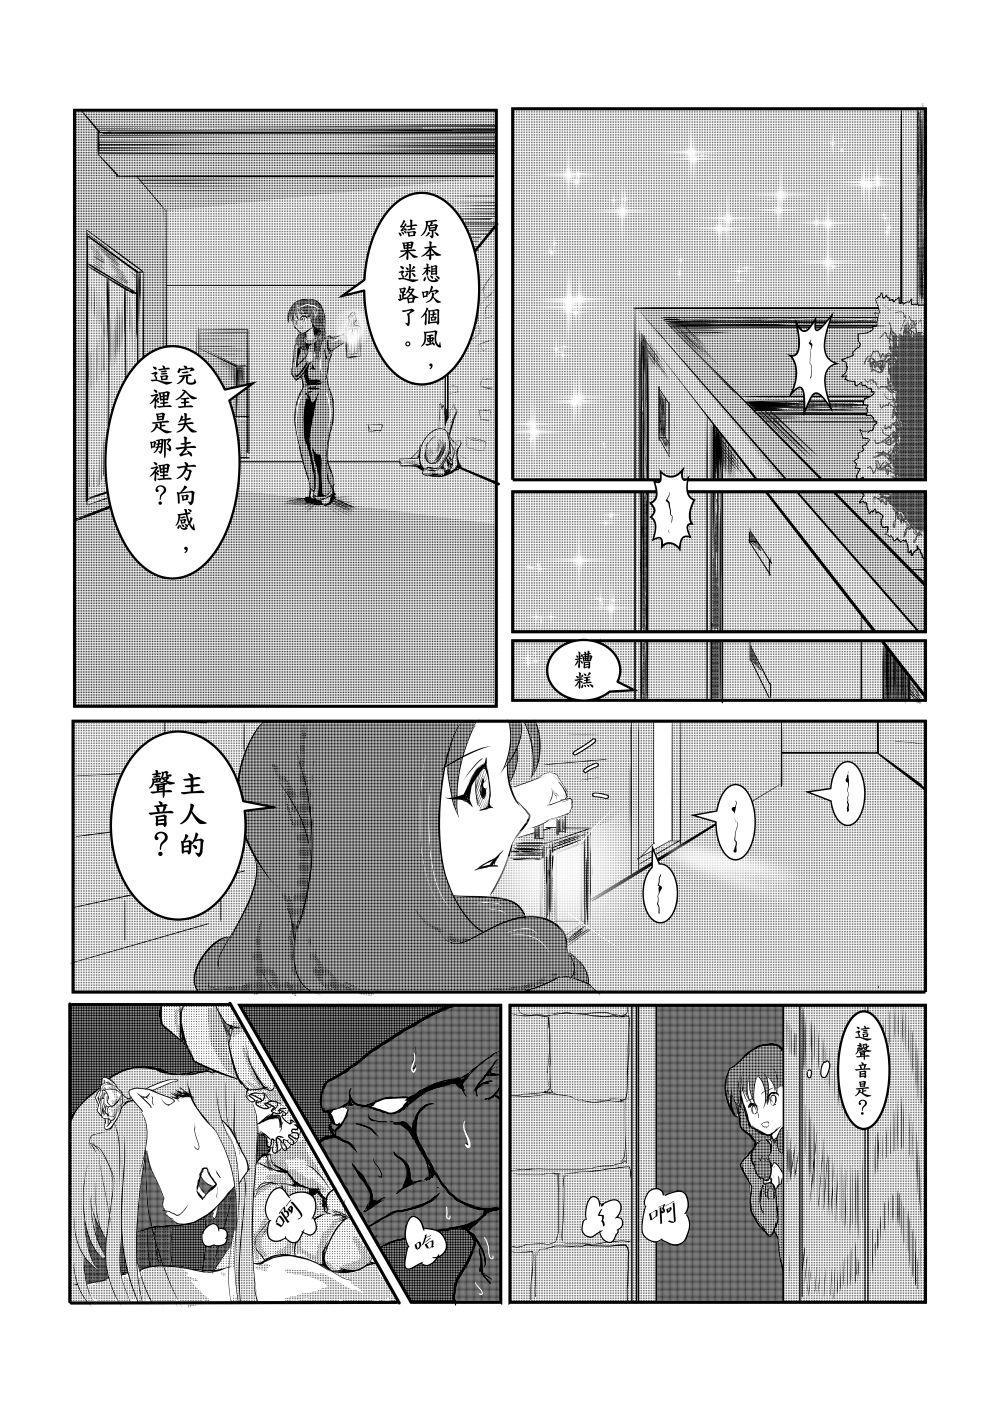 Maou Yuusha - Kachiku Kiki 3 11